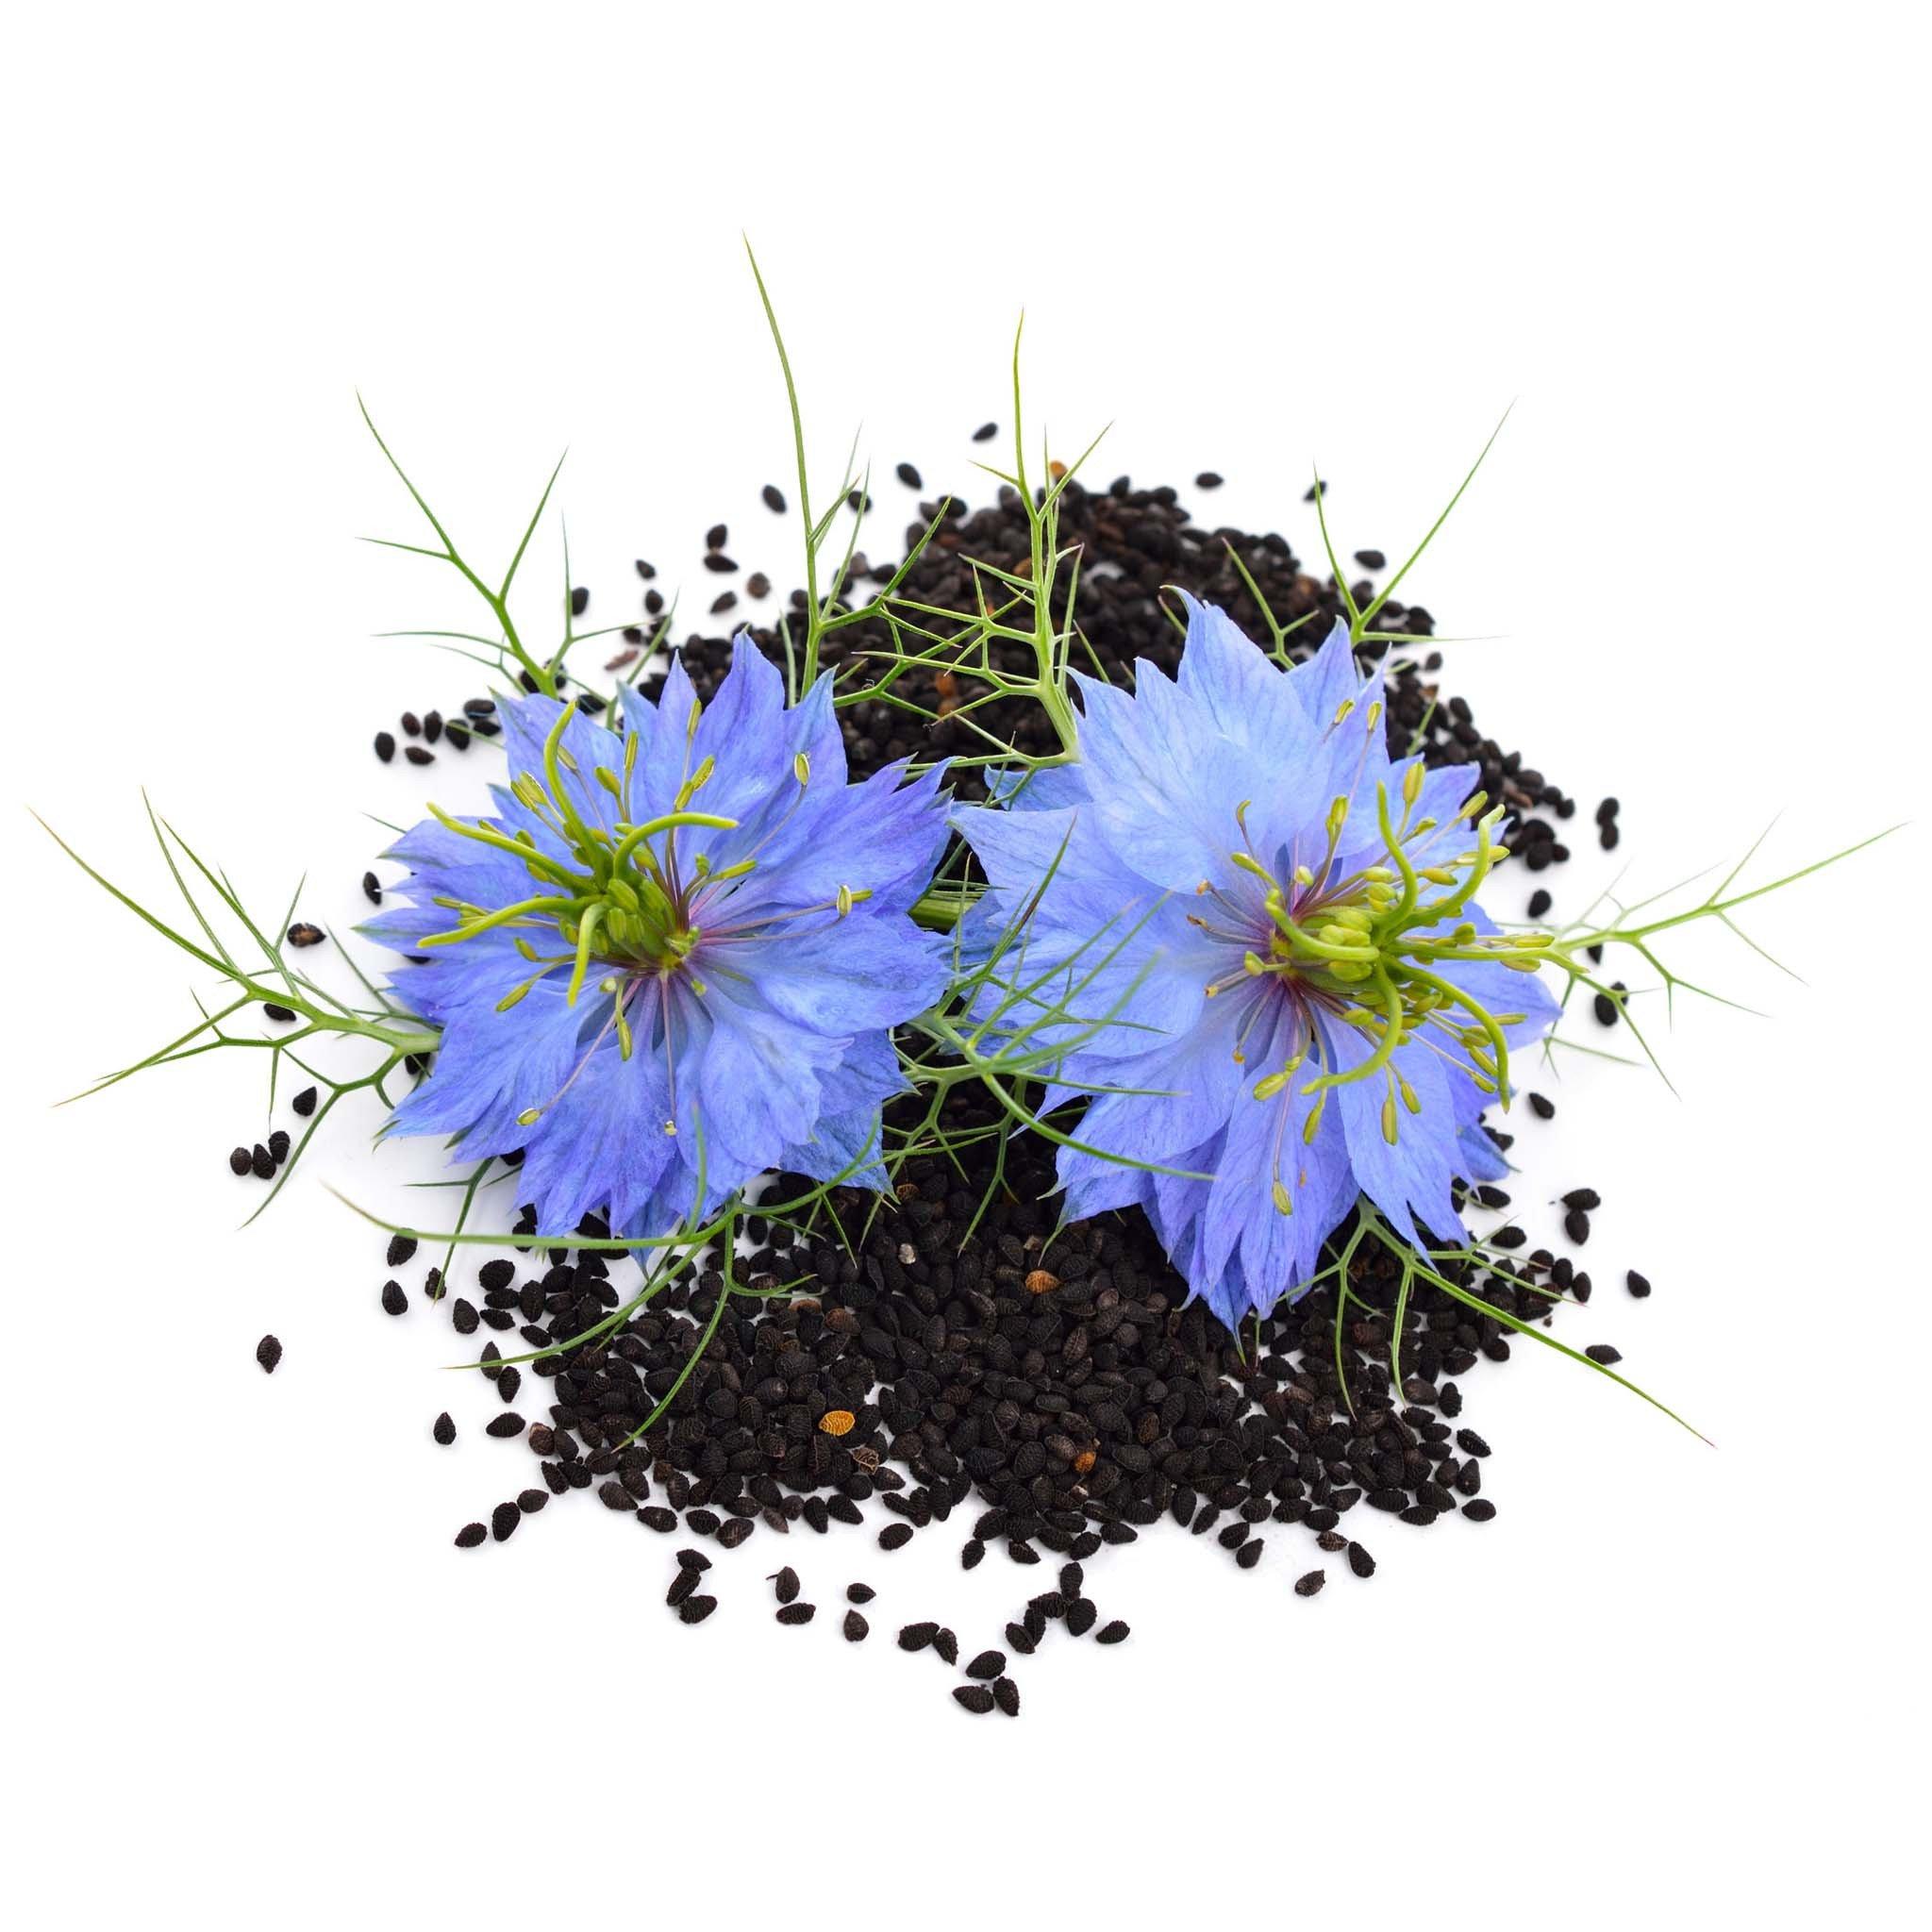 Black Cumin Oil – Secrets revealed!